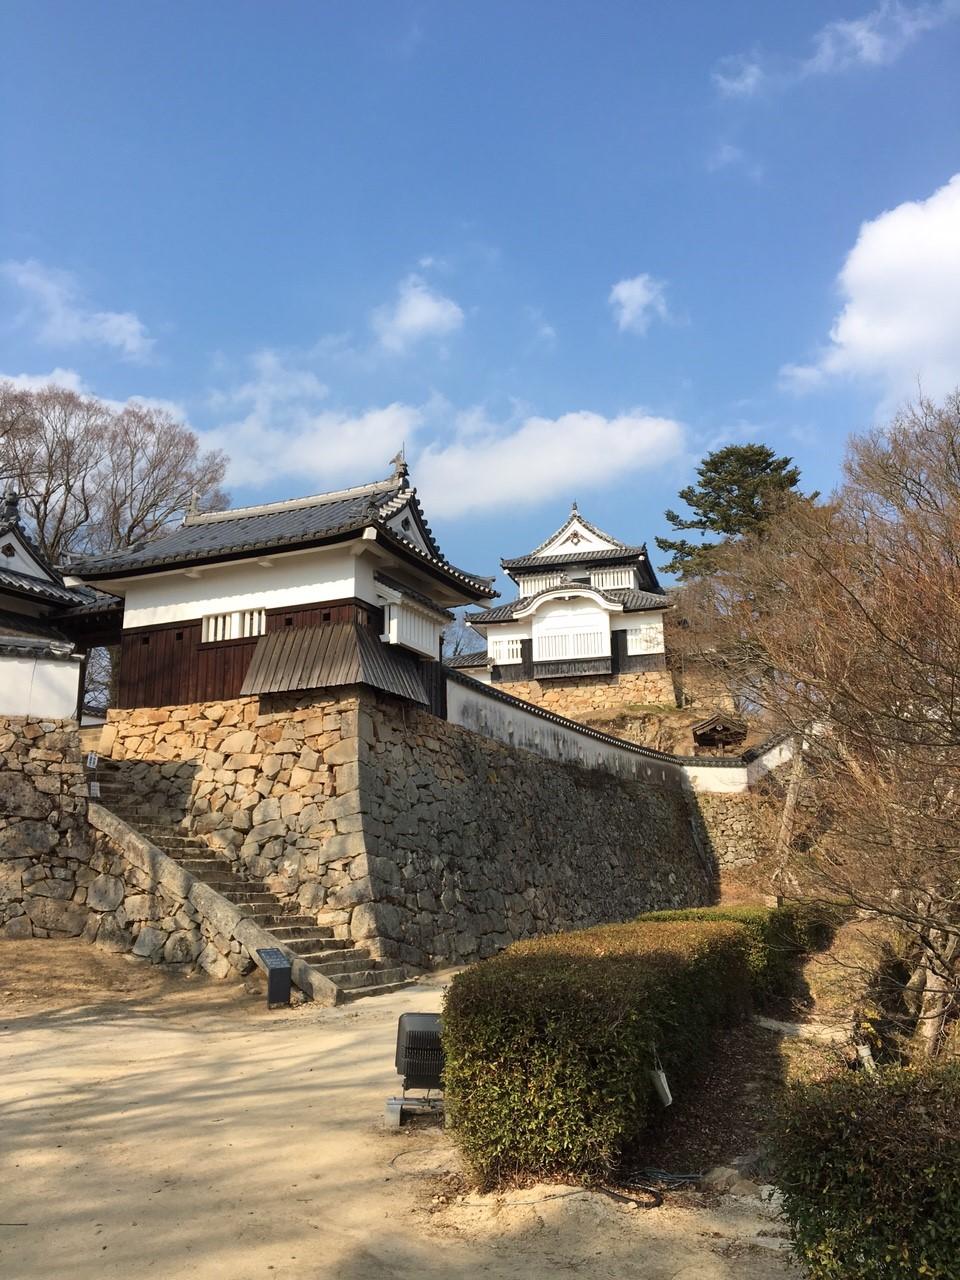 Okayama Bitchu-Takahashi Matsuyama, one of oldest castles in Japan